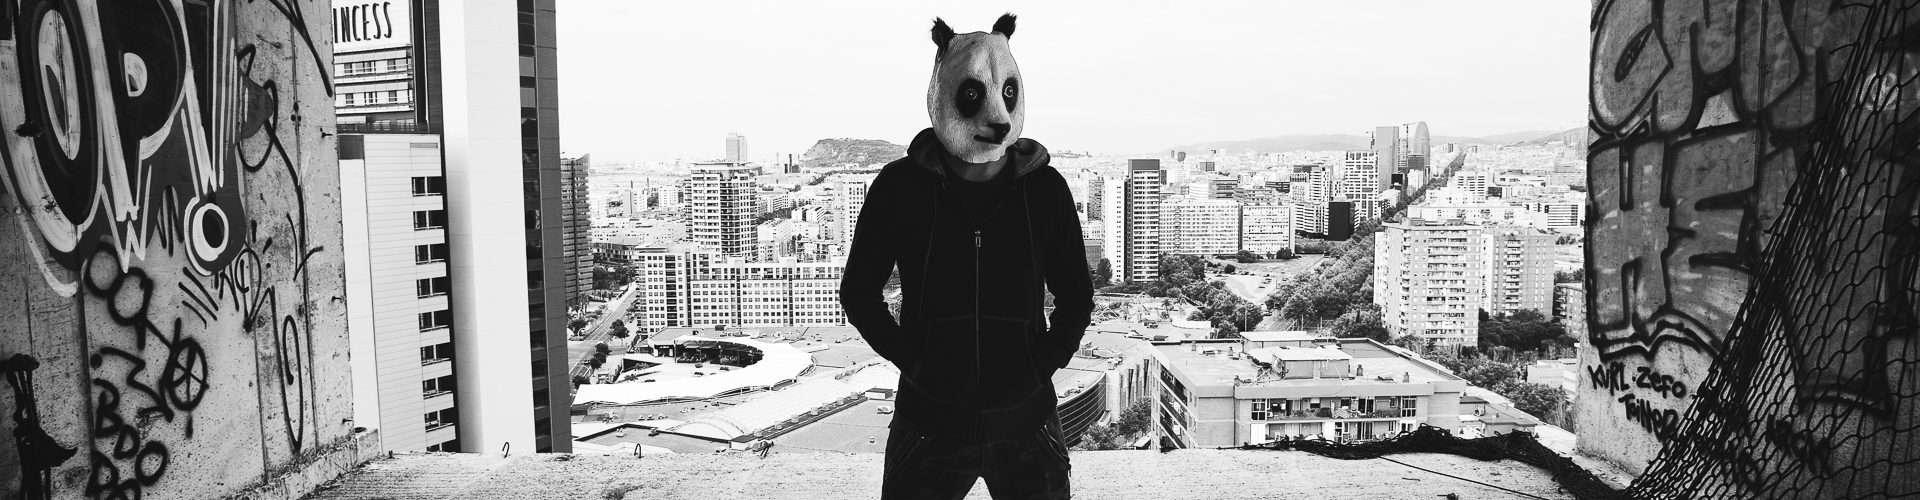 Panda urbex - Crédits : Gauvin Pictures